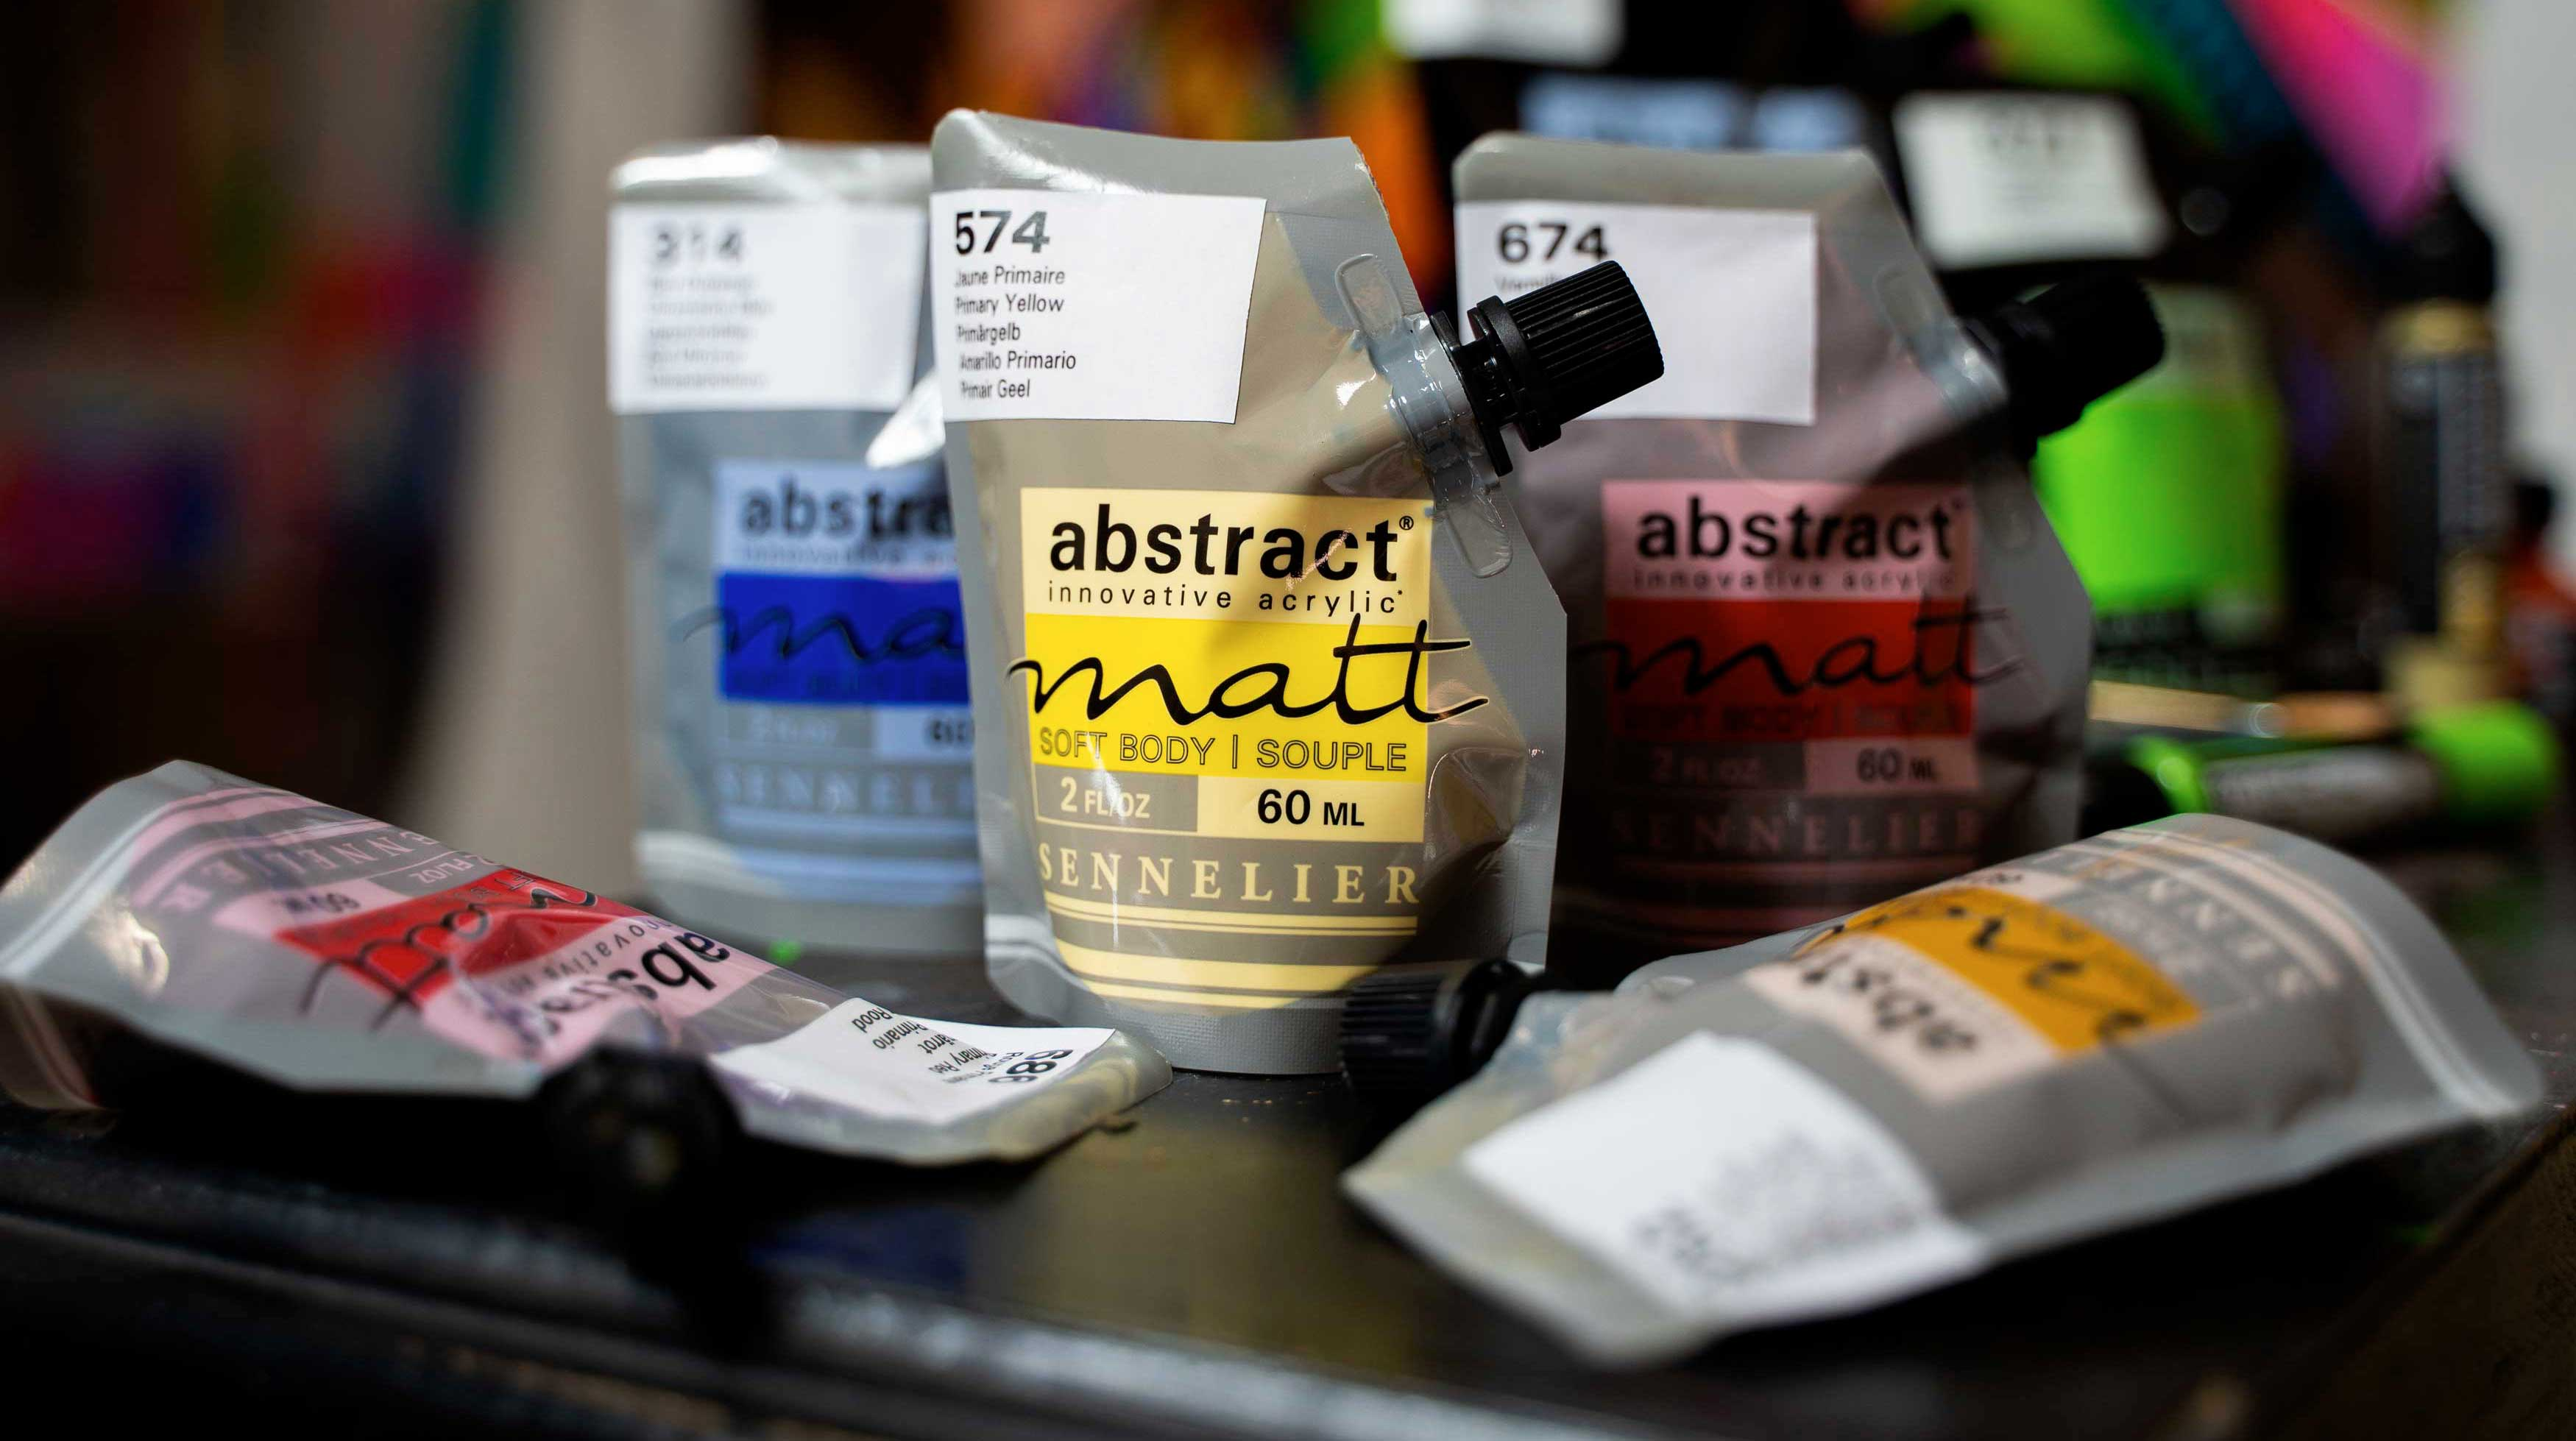 Matt Acrylic